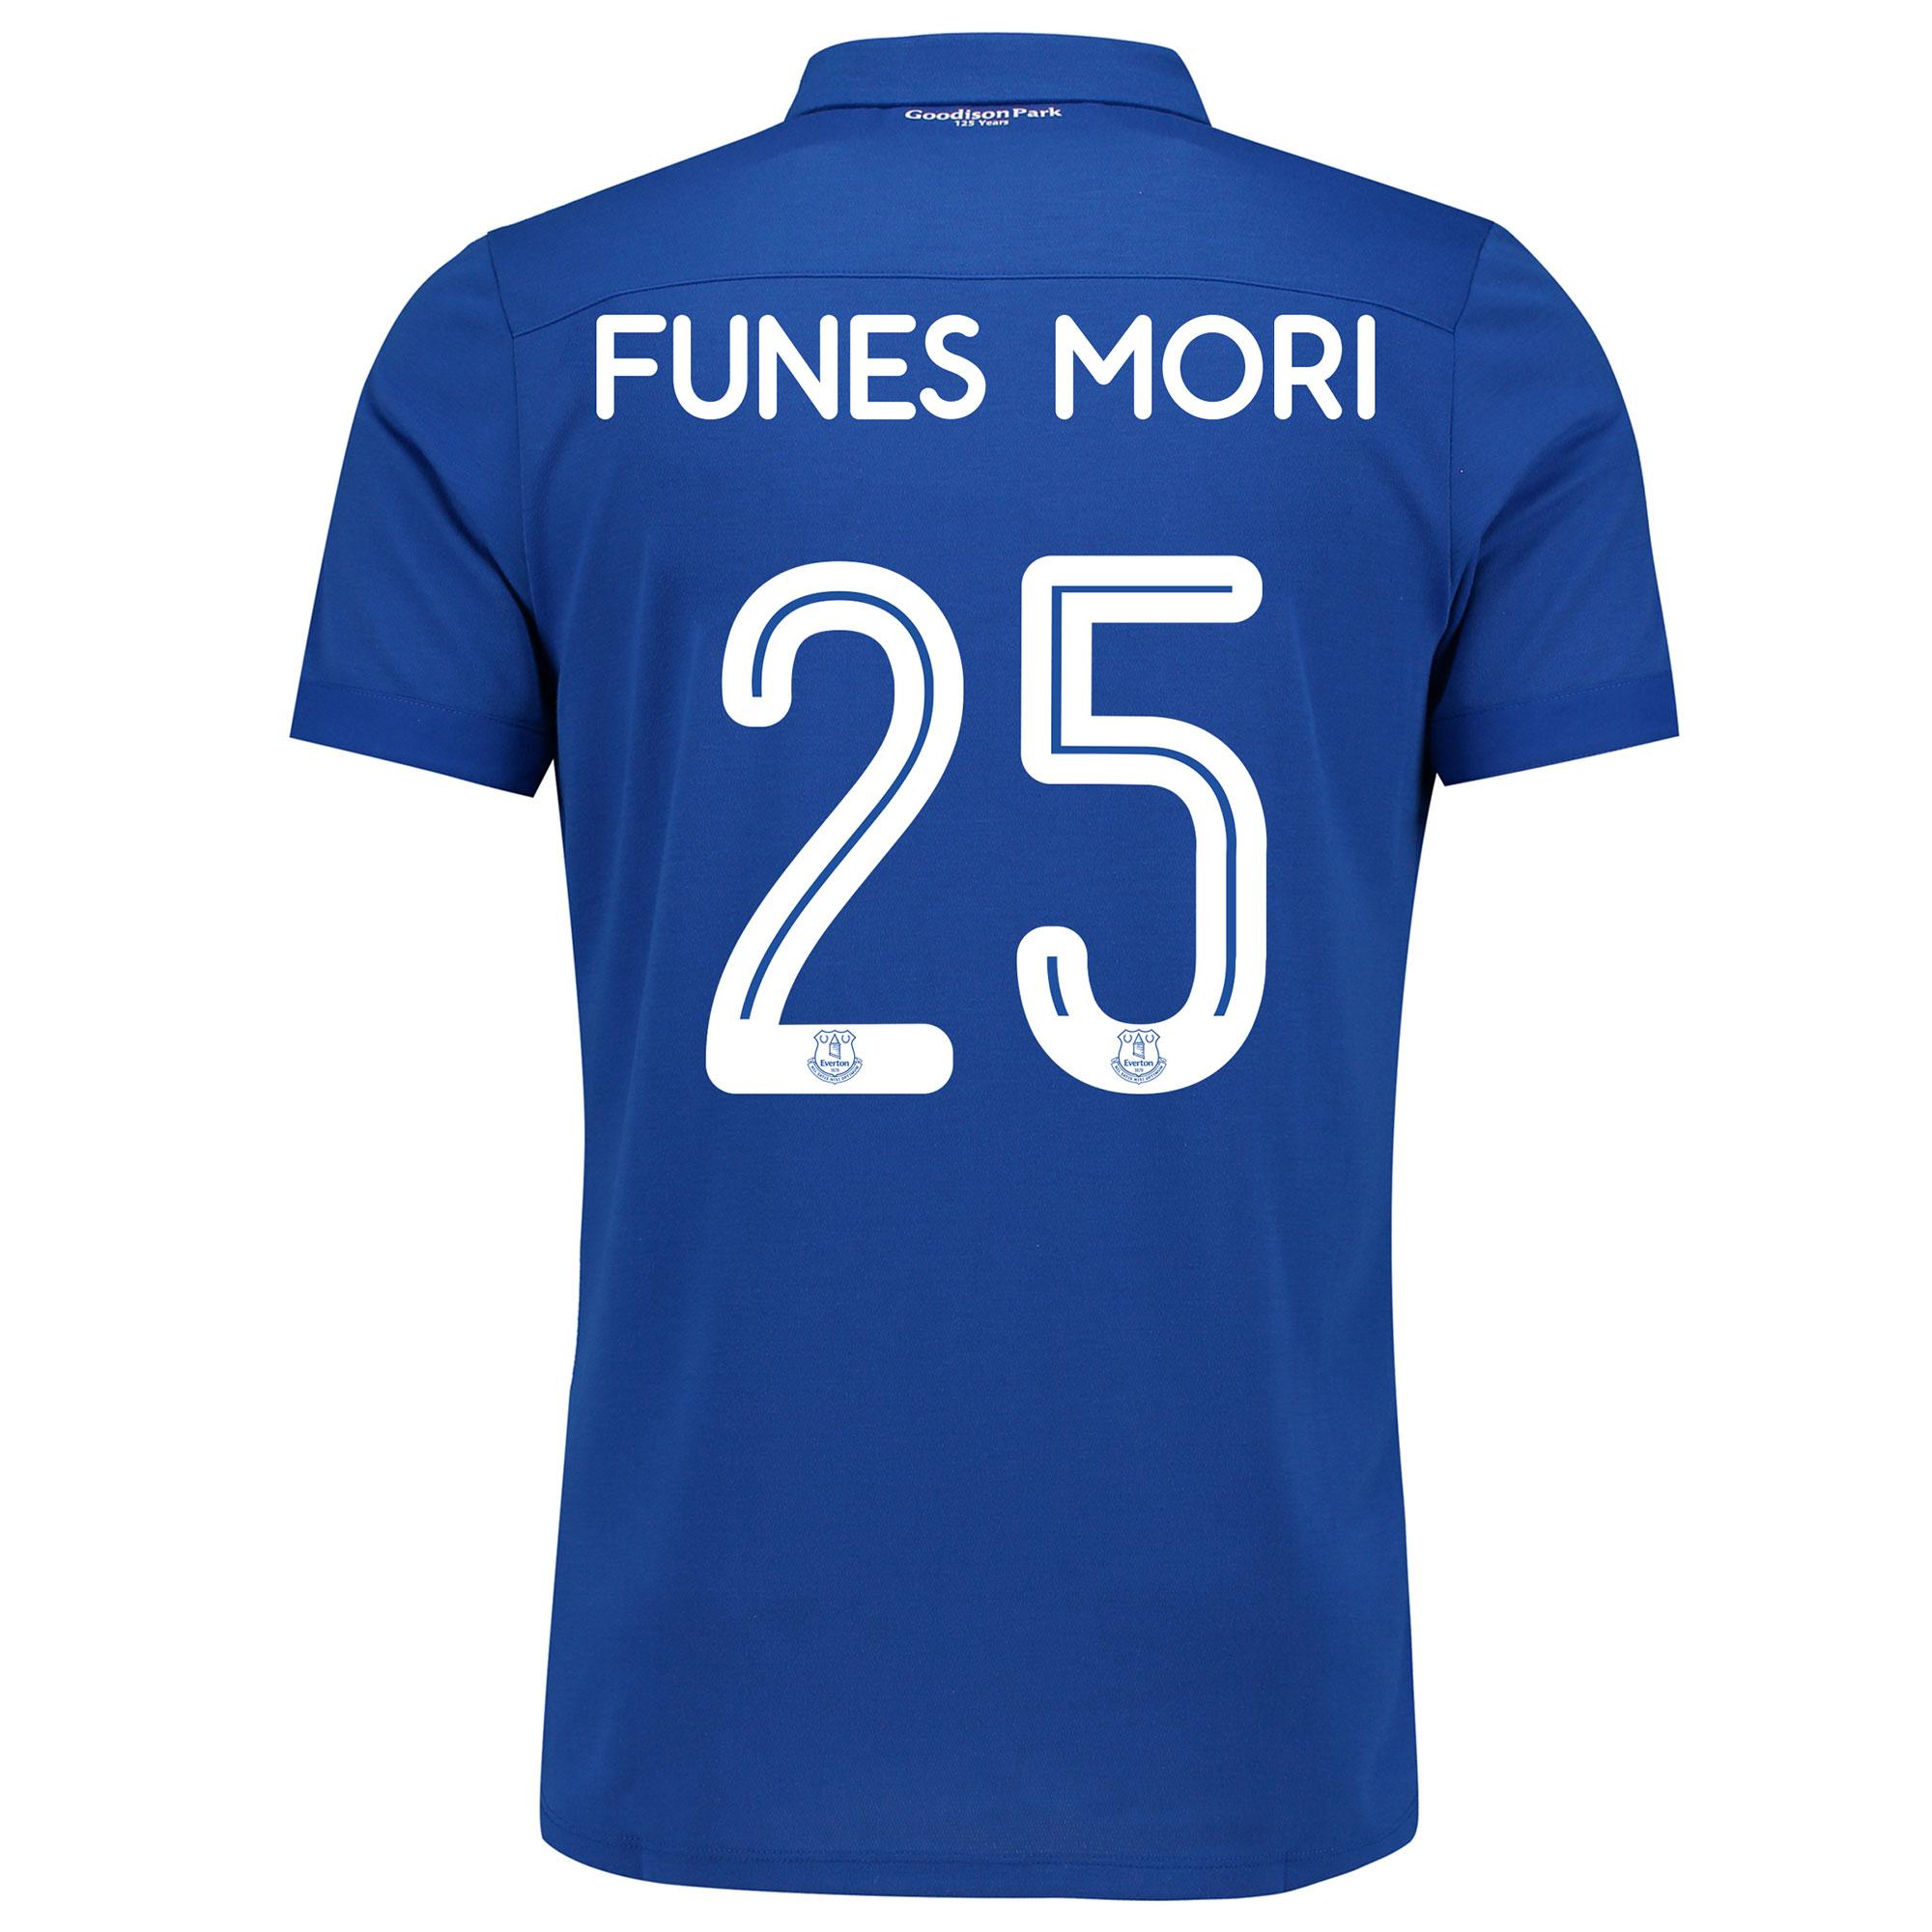 Image of Everton Commemorative Shirt - Junior with Funes Mori 25 printing